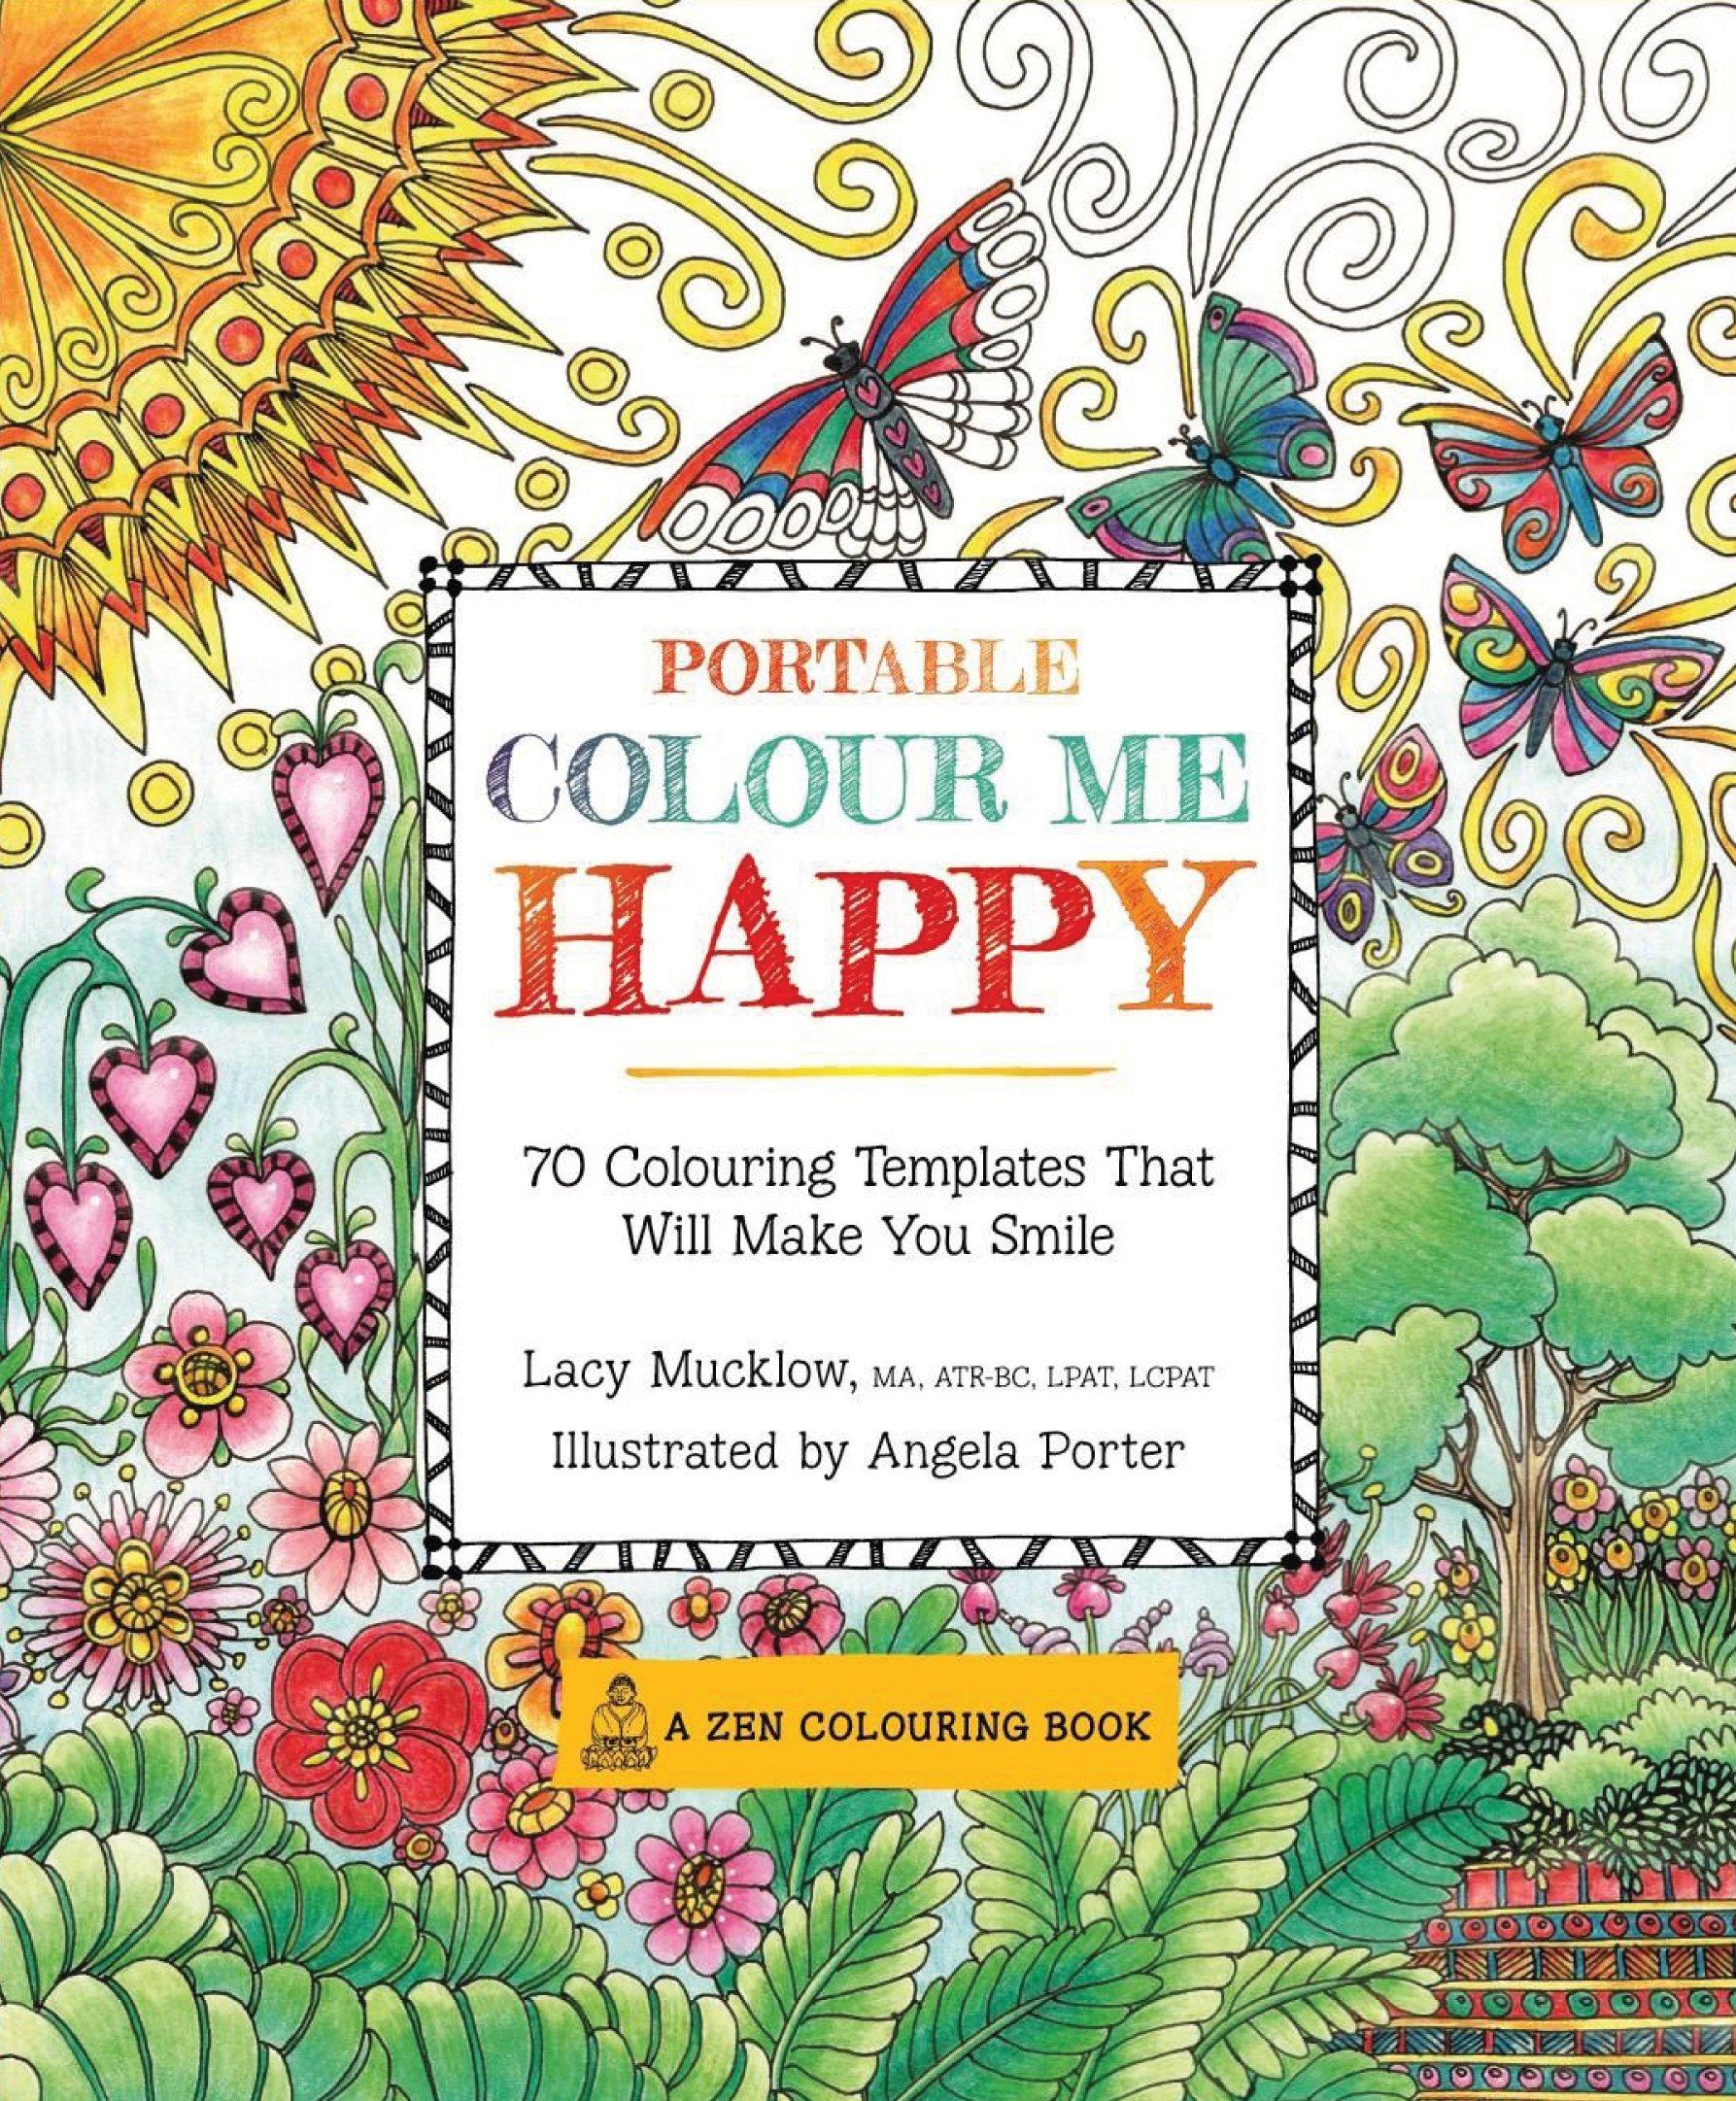 - Portable Colour Me Happy (A Zen Coloring Book): Amazon.co.uk